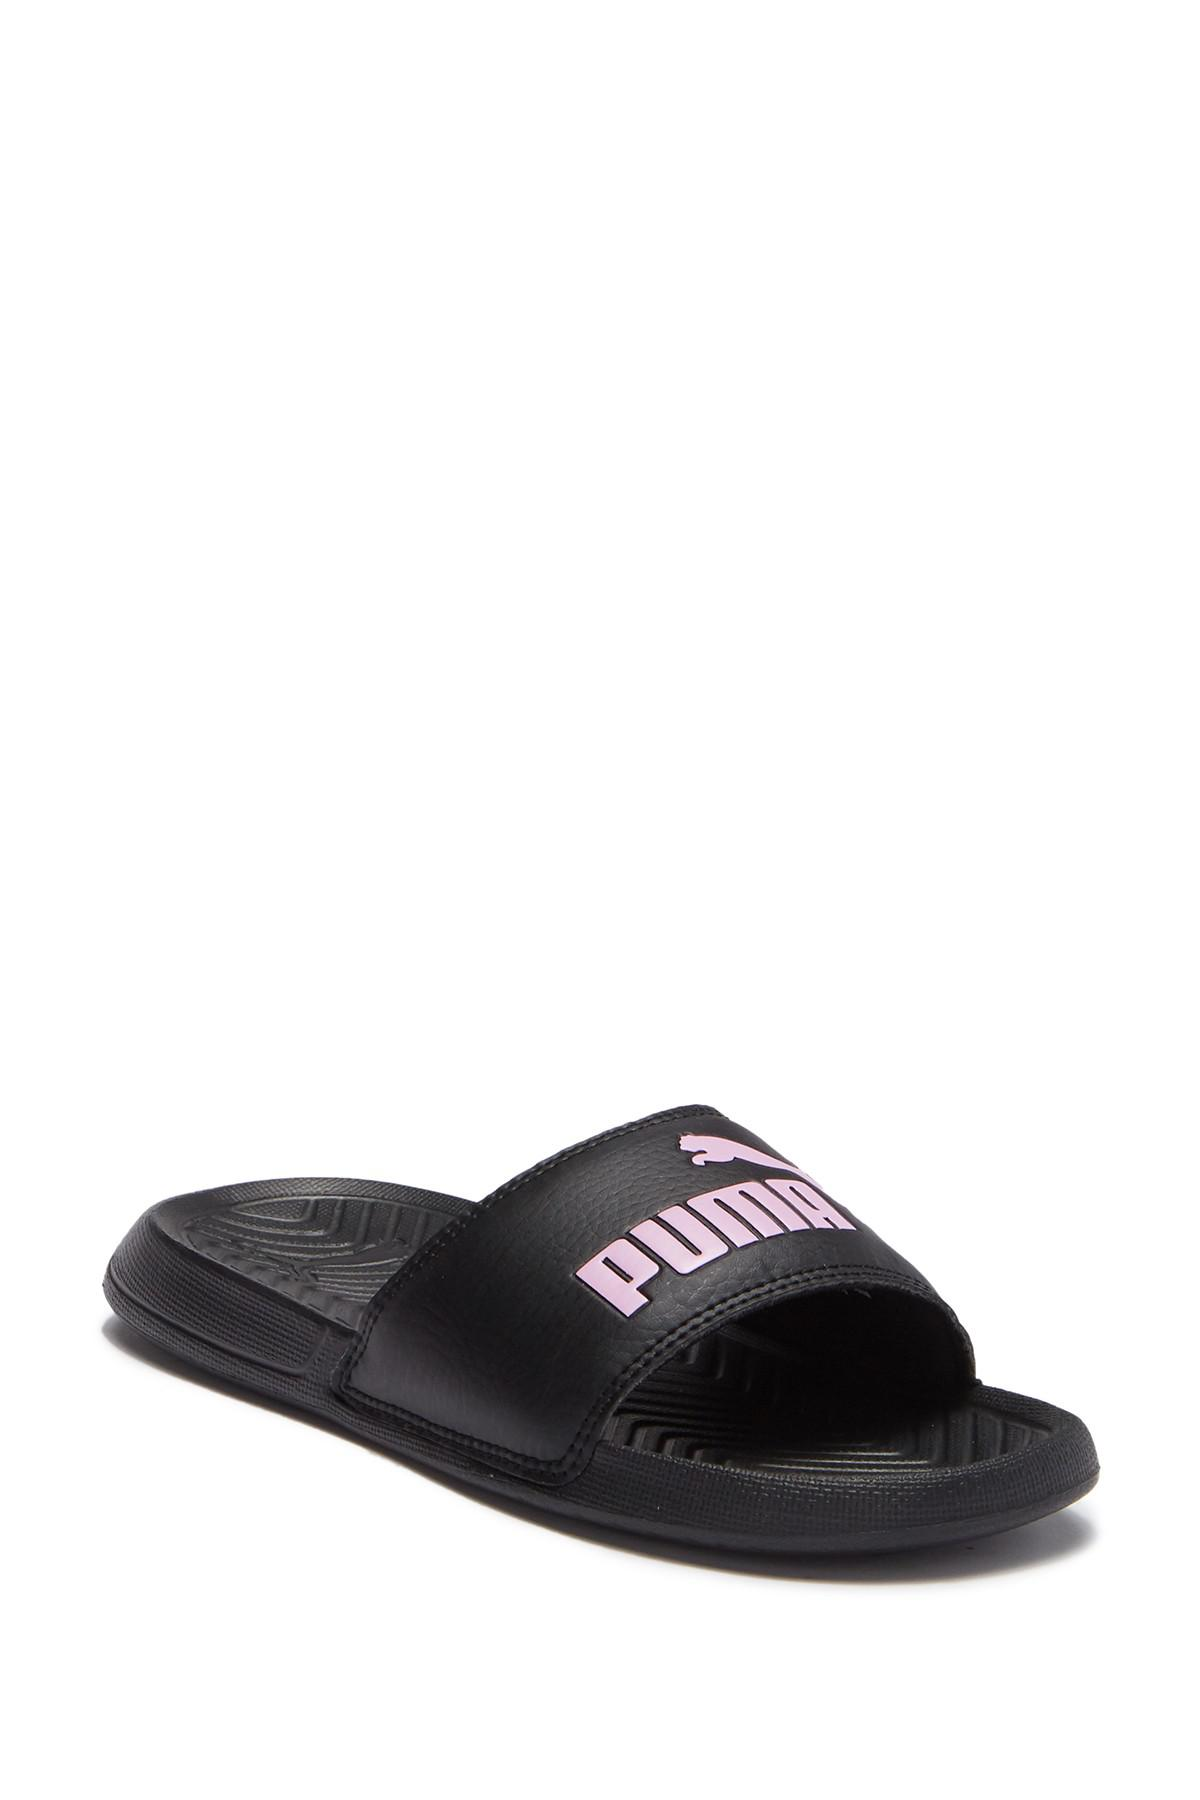 decba53e2f7f Lyst - PUMA Popcat Jr. Slide Sandal in Black for Men